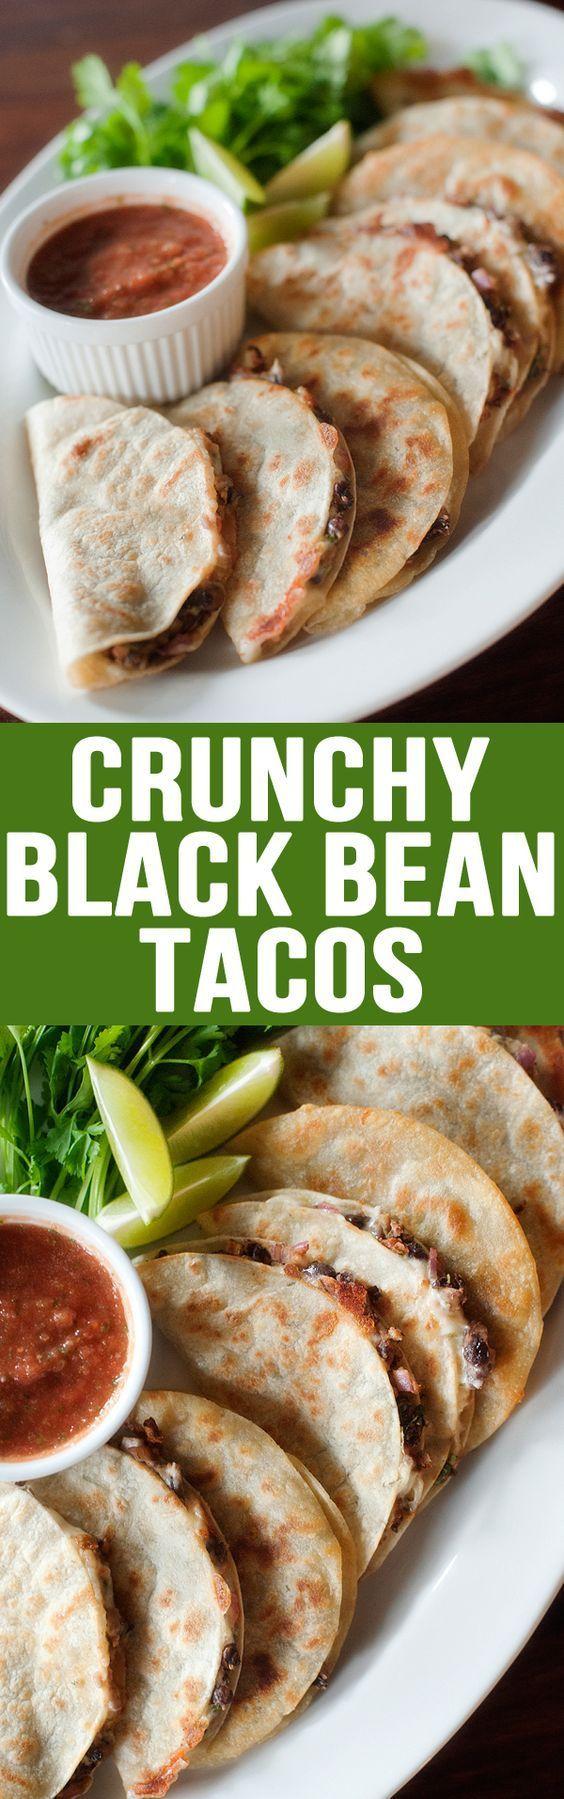 Crunchy Black Bean Tacos